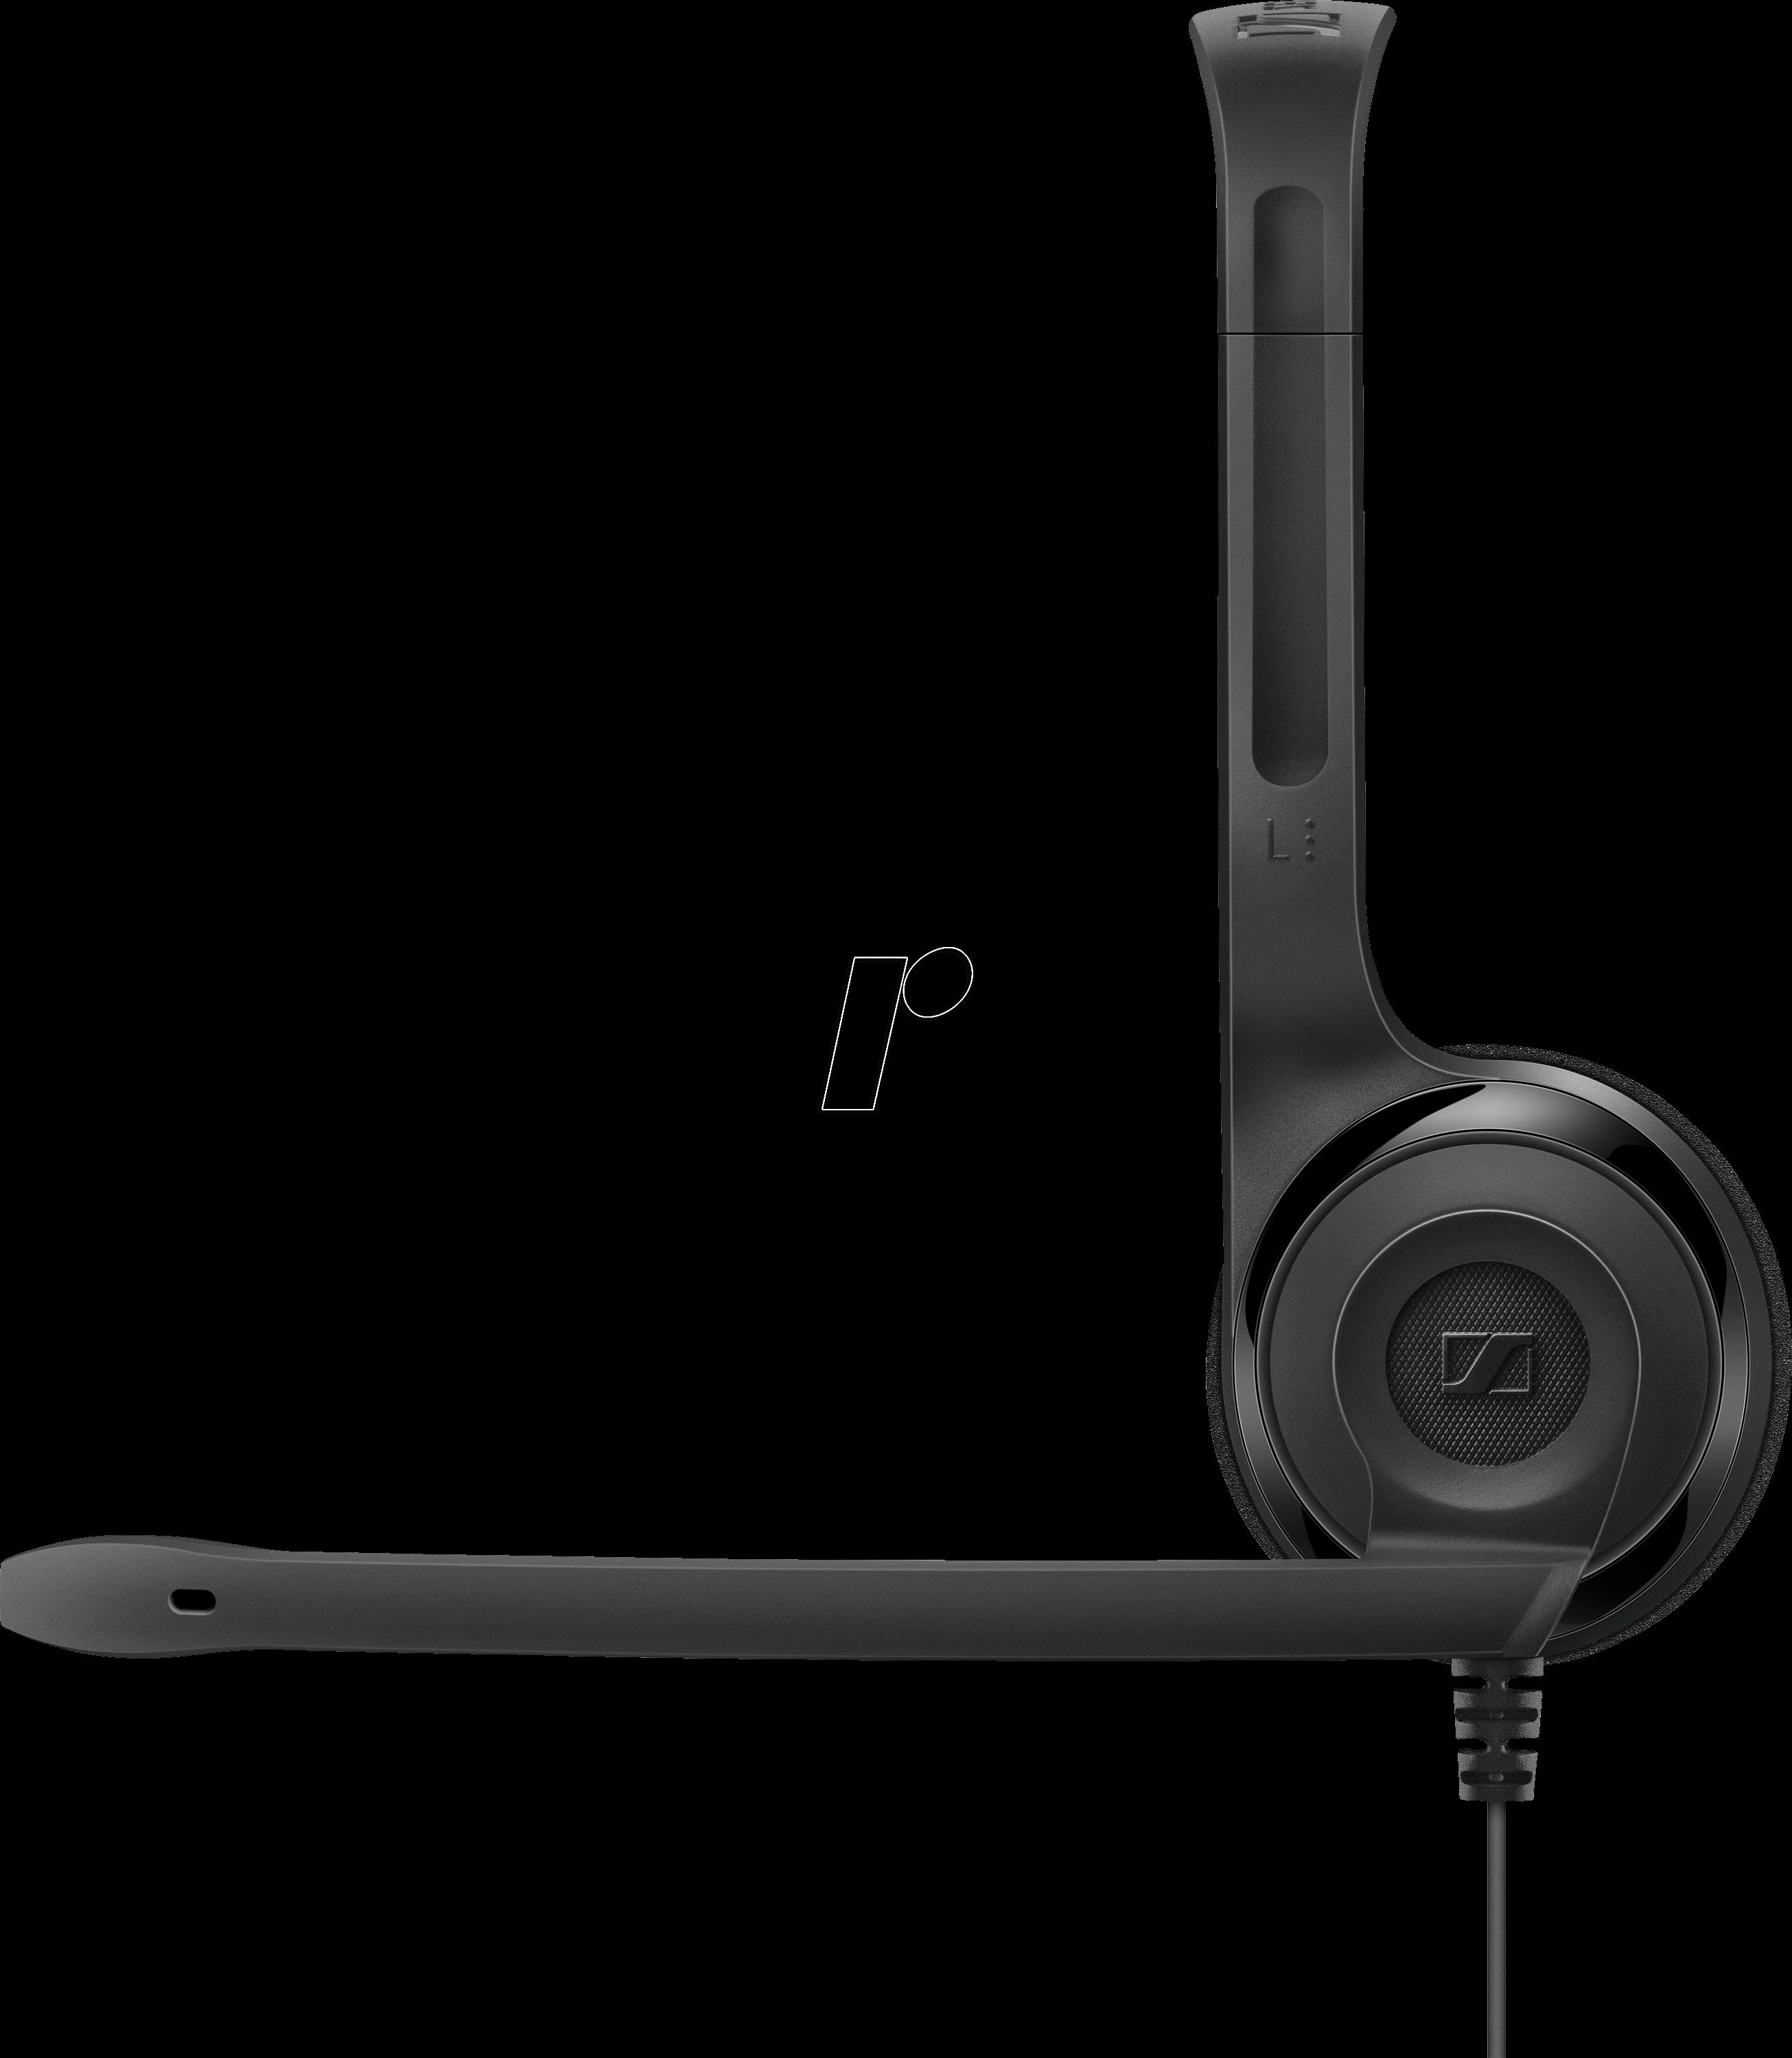 Sennheiser508328 Headset Jack Voip Stereo Pc 5 Chat